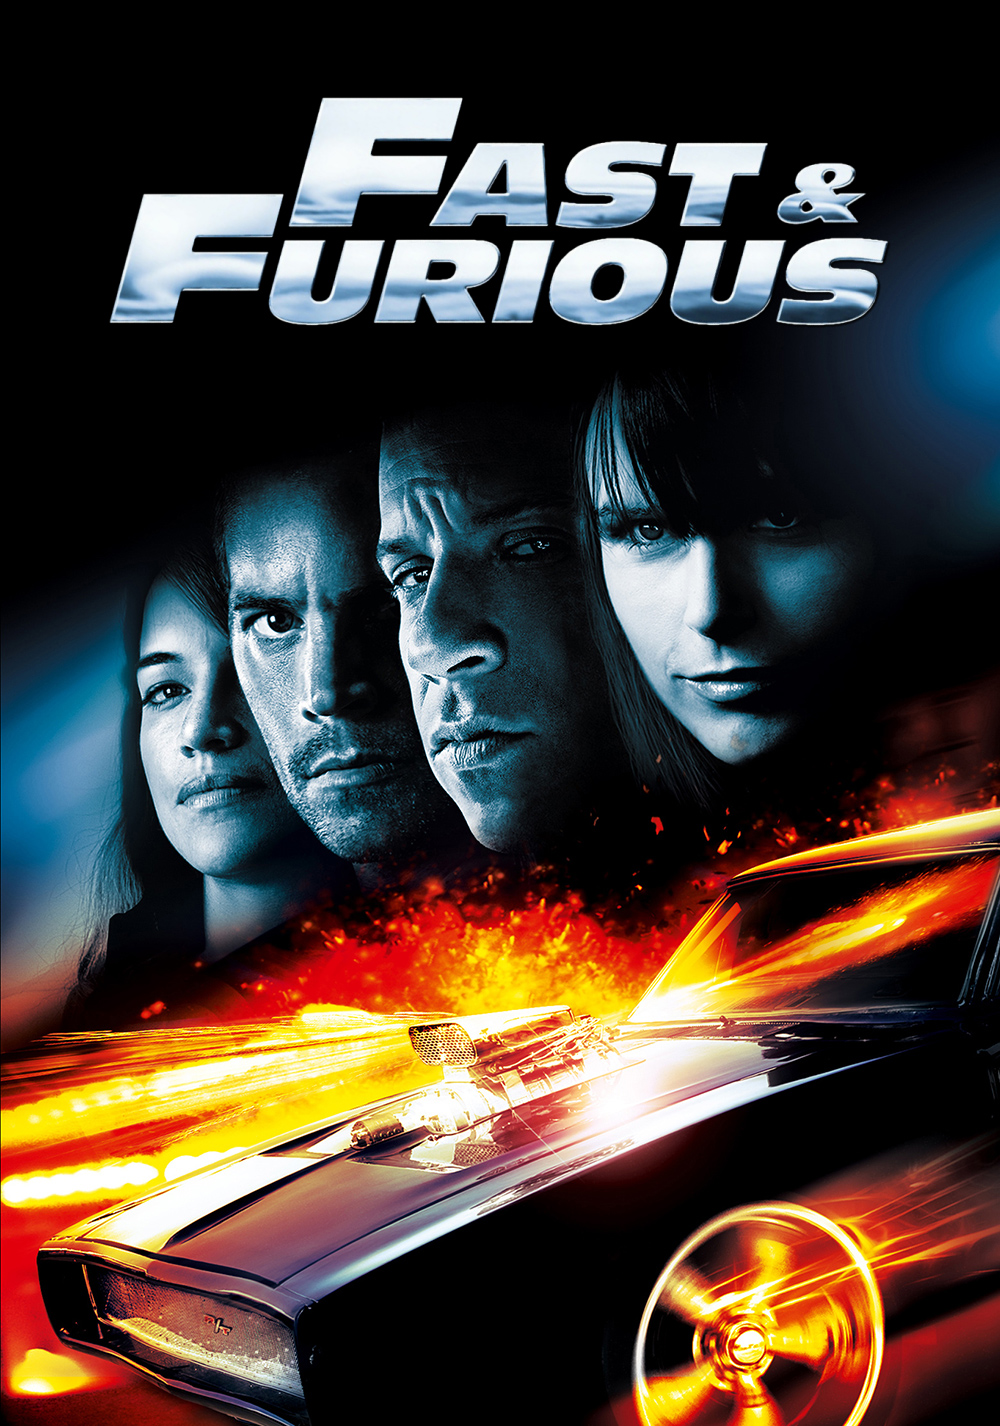 4 fast furious movie